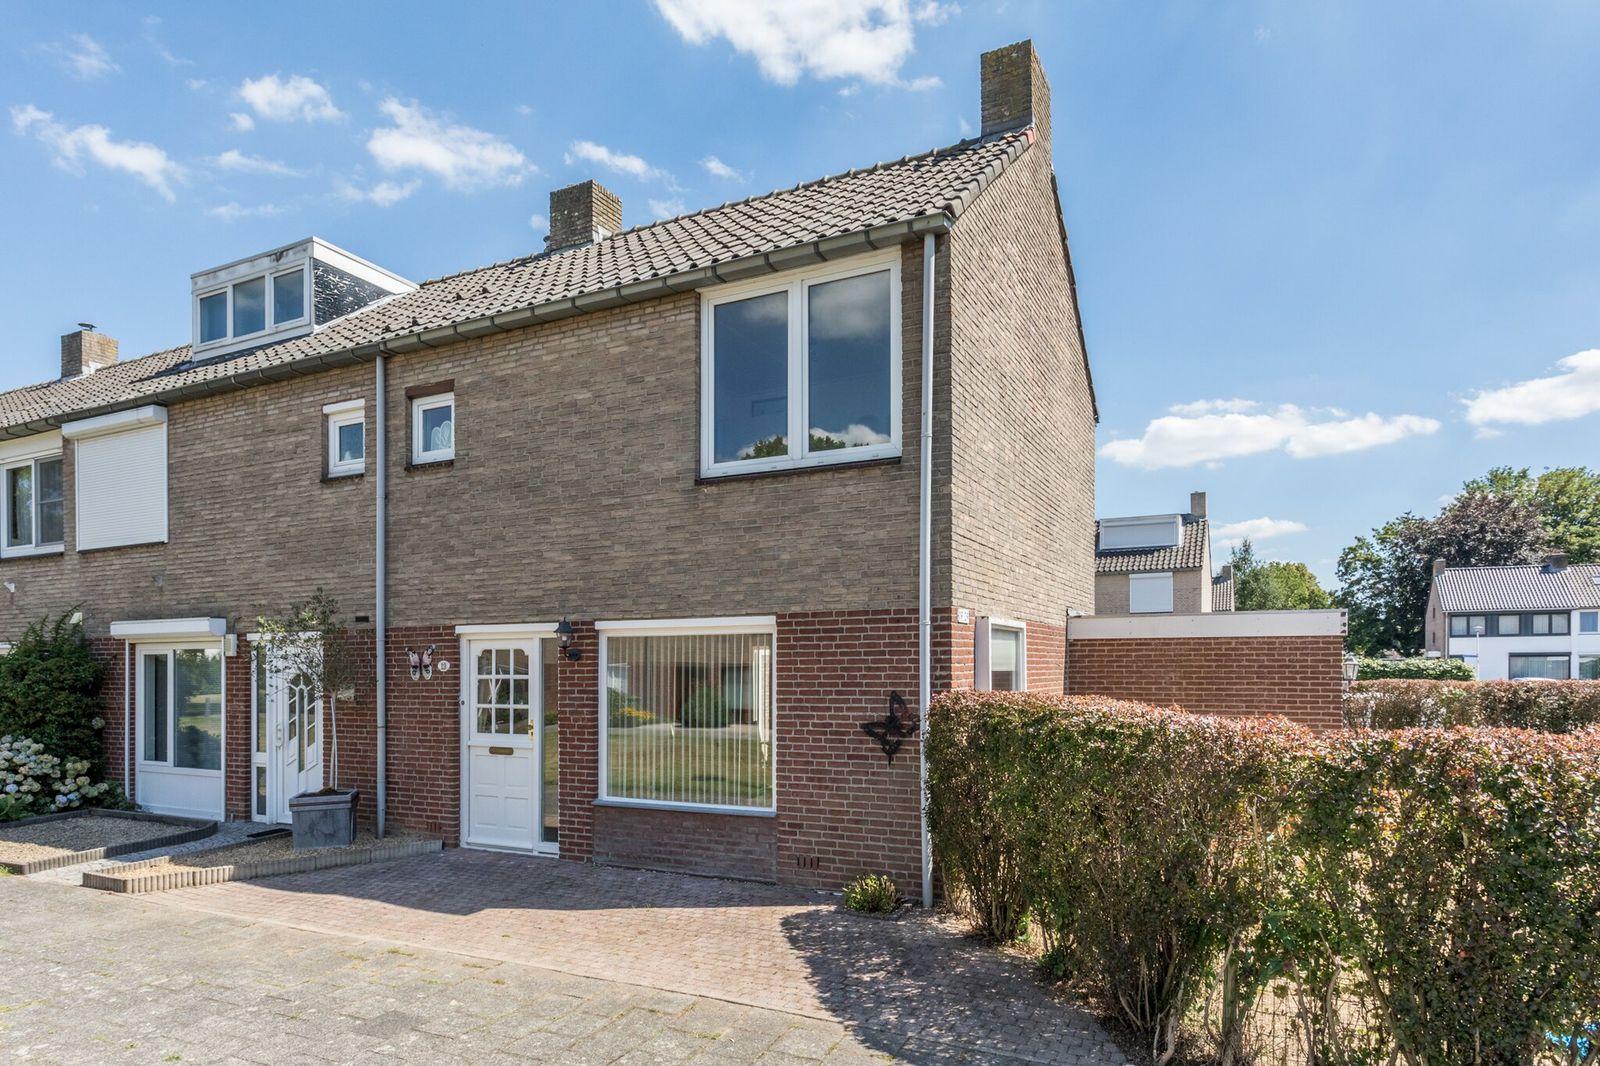 Karbindersdreef 19, Maastricht